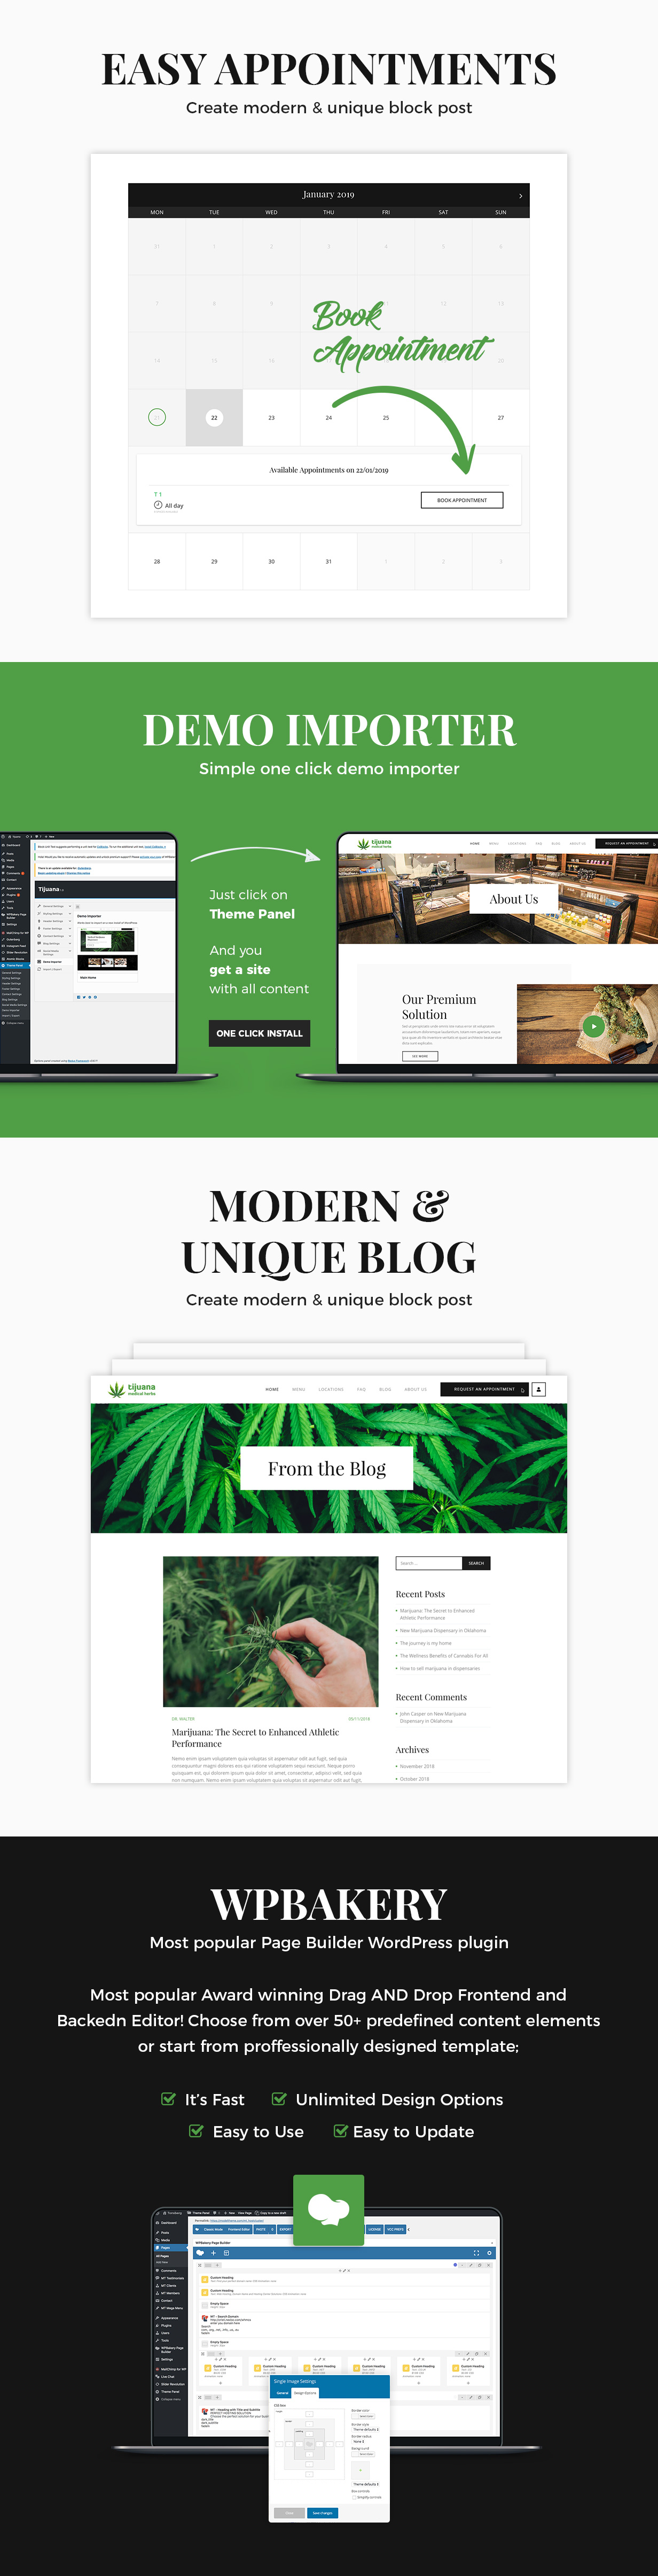 Tijuana - Marijuana Dispensary & Medical WordPress Theme - 6